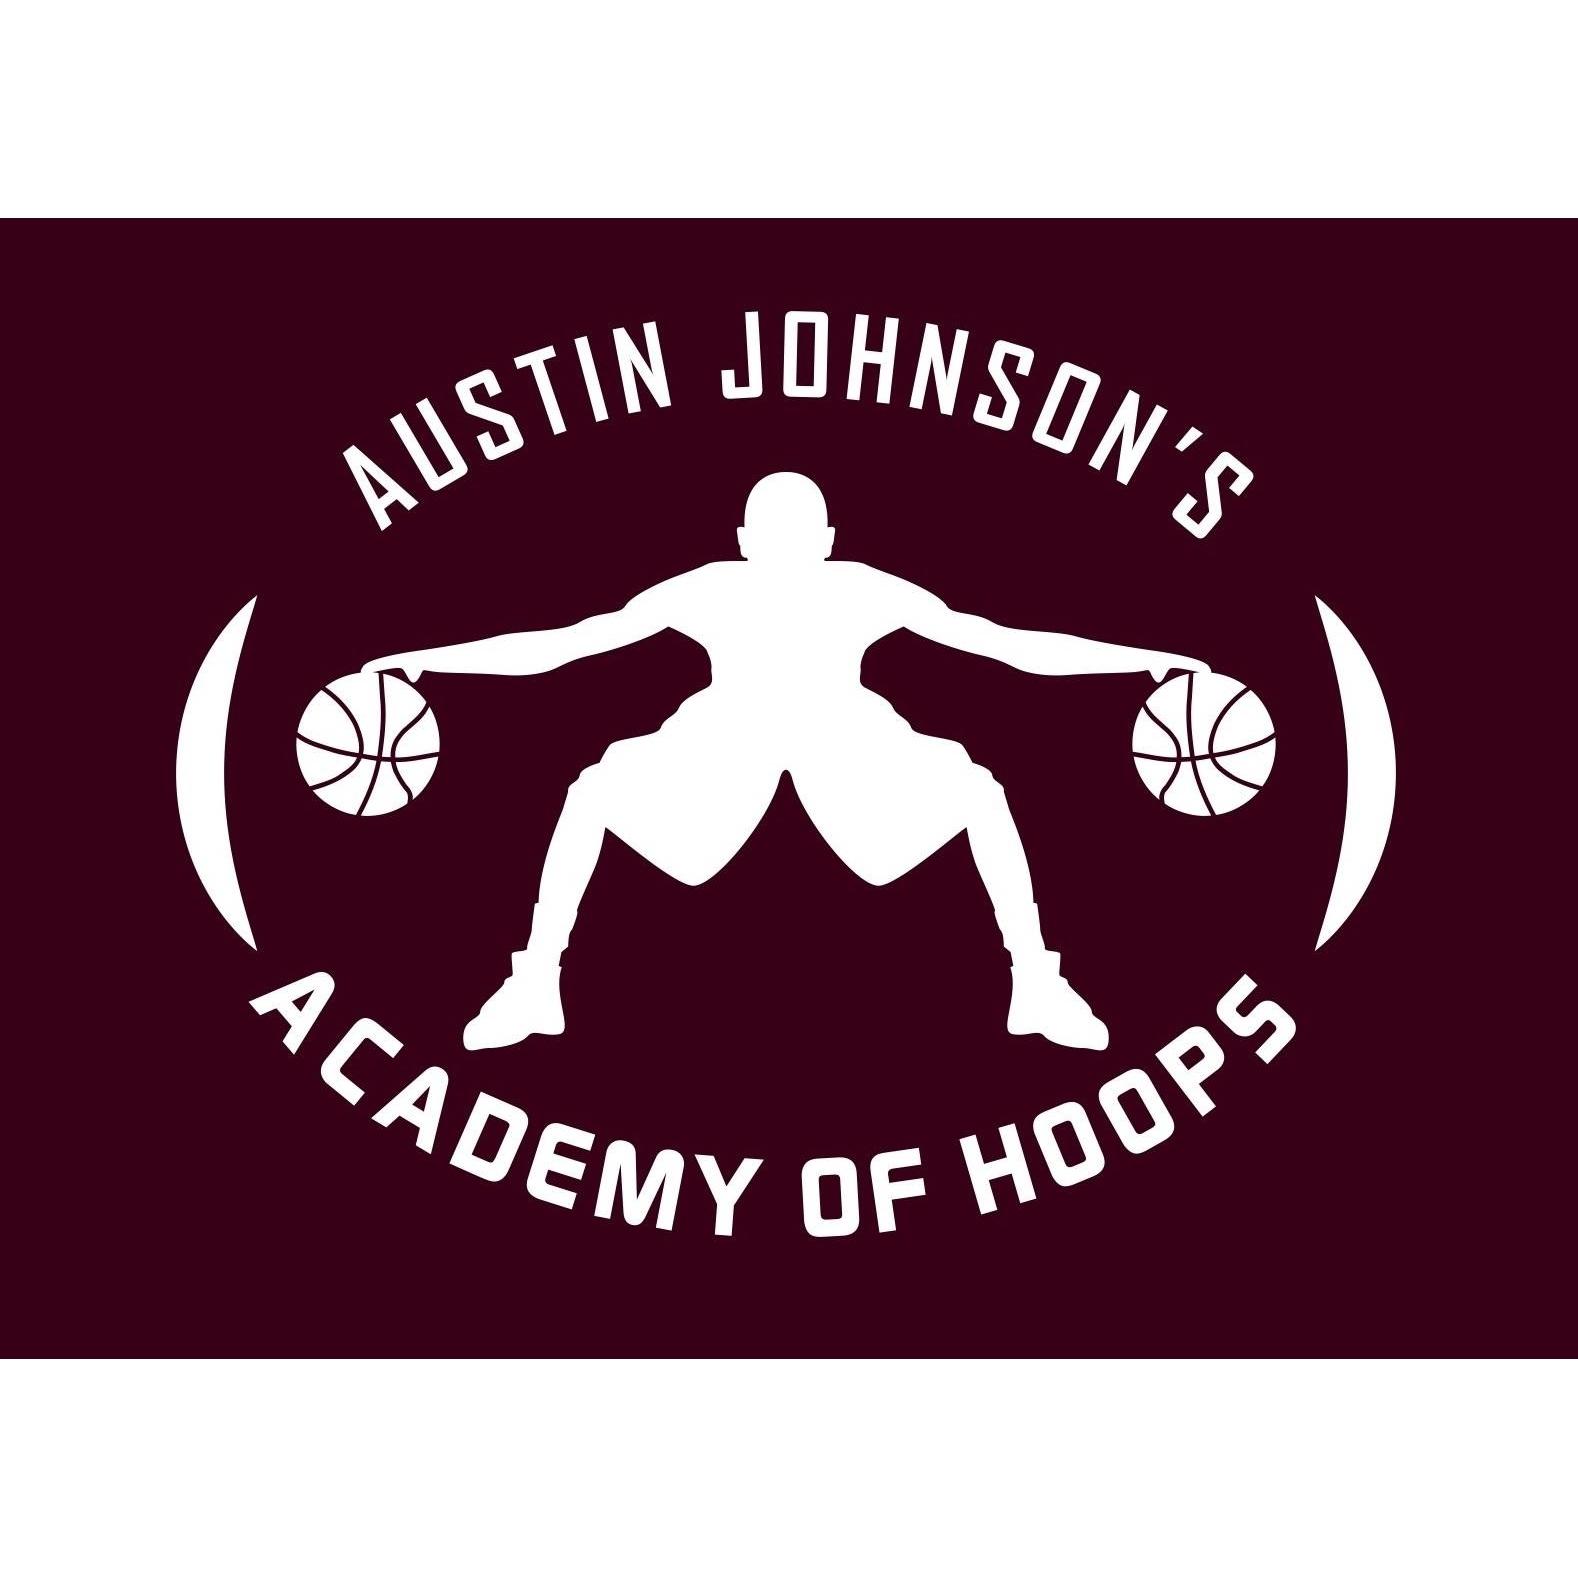 Austin Johnson's Academy of Hoops